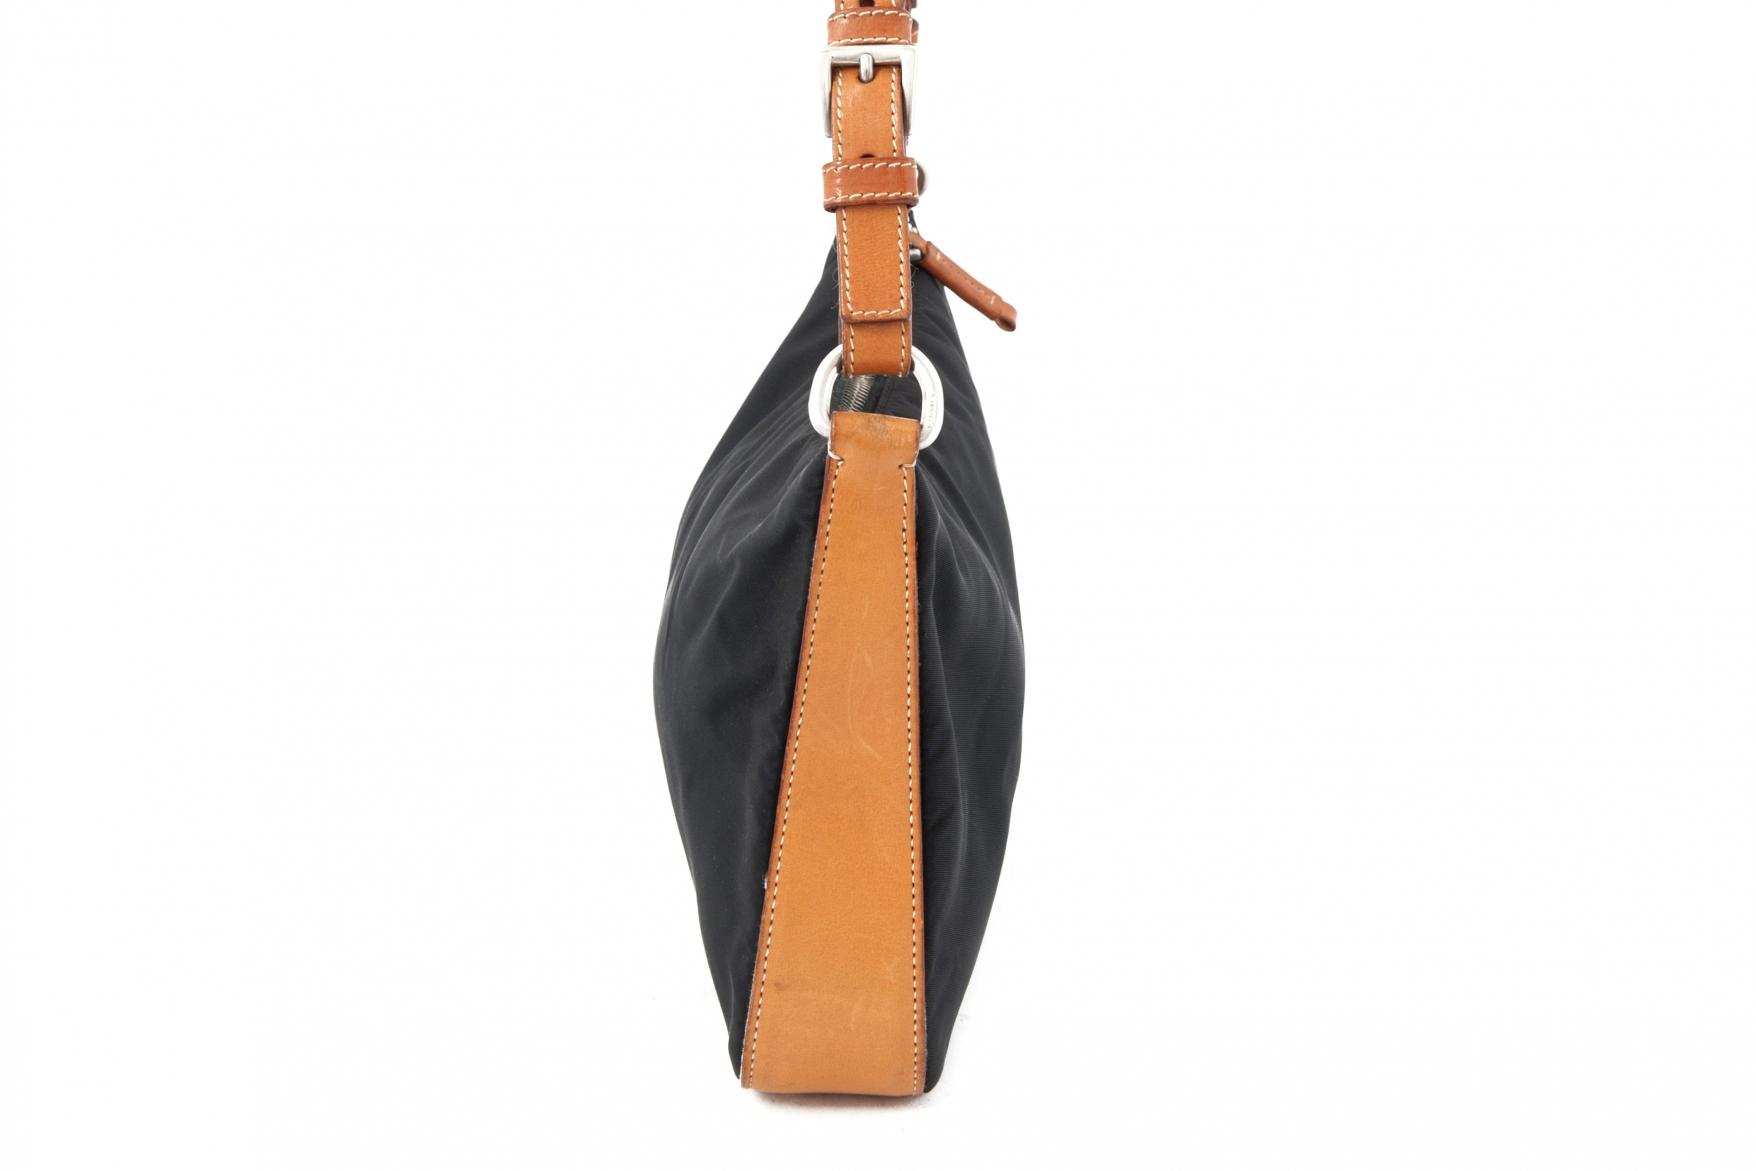 Prada blue fabric and brown leather handbag - Vintage Shop in Mykonos